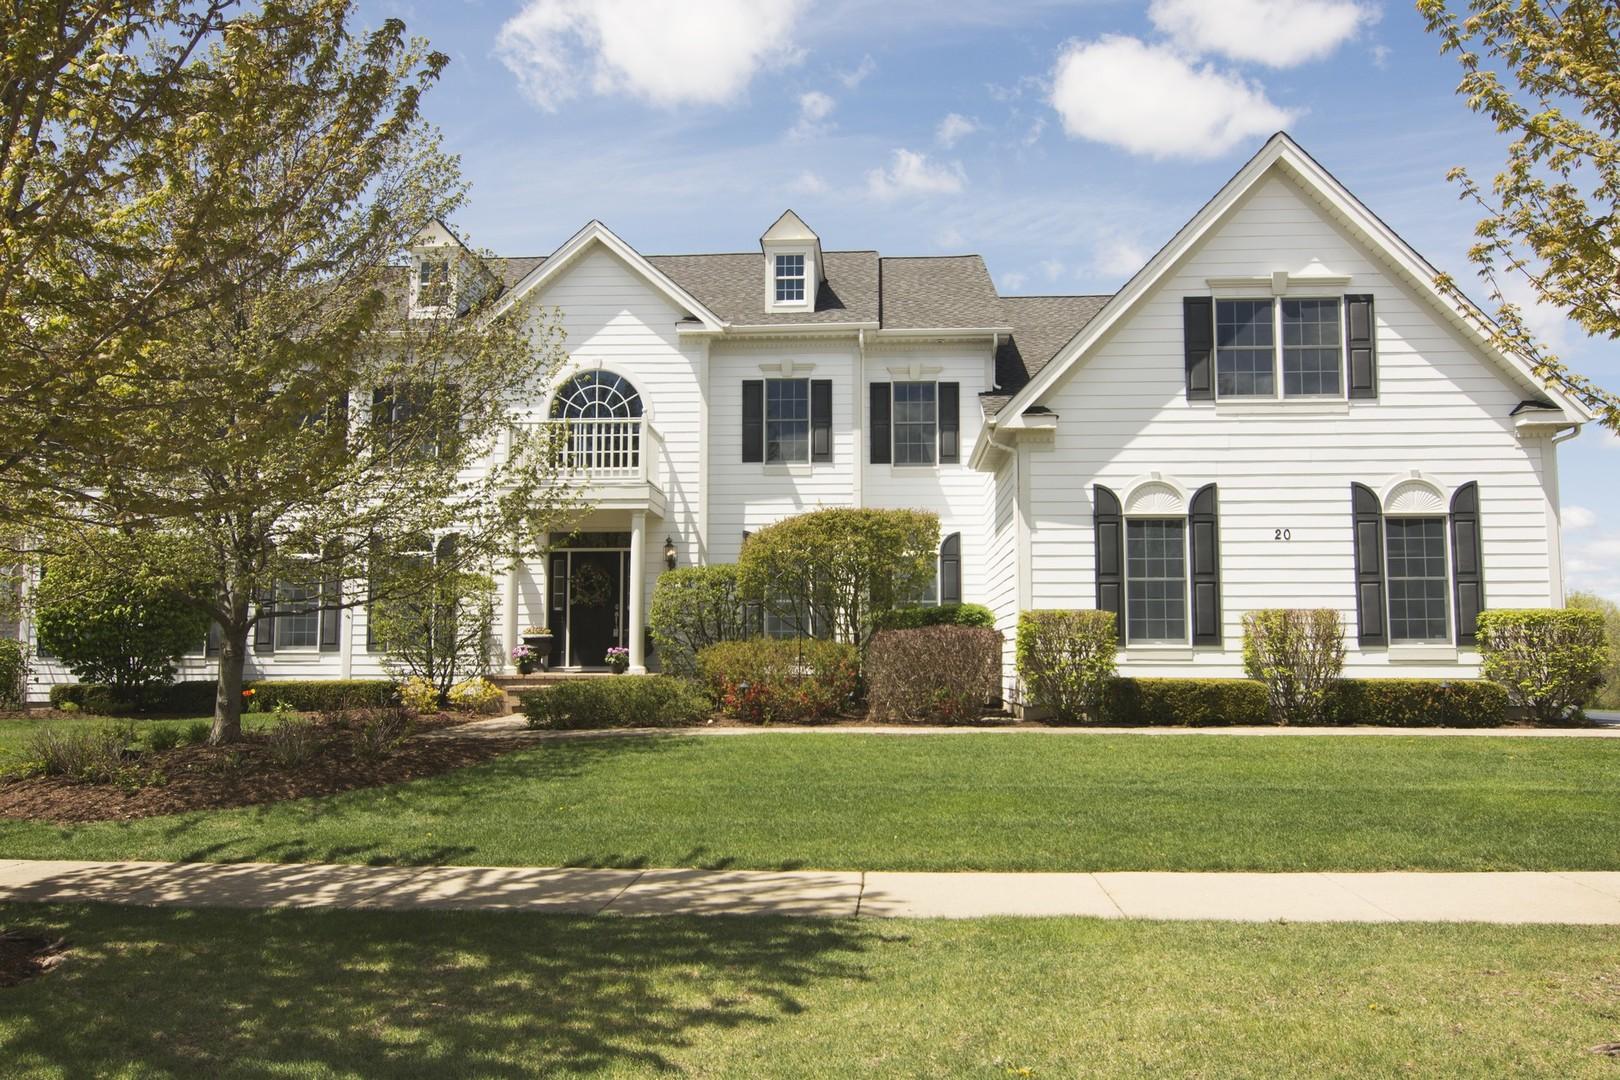 20 Doral Drive, Hawthorn Woods, Illinois 60047